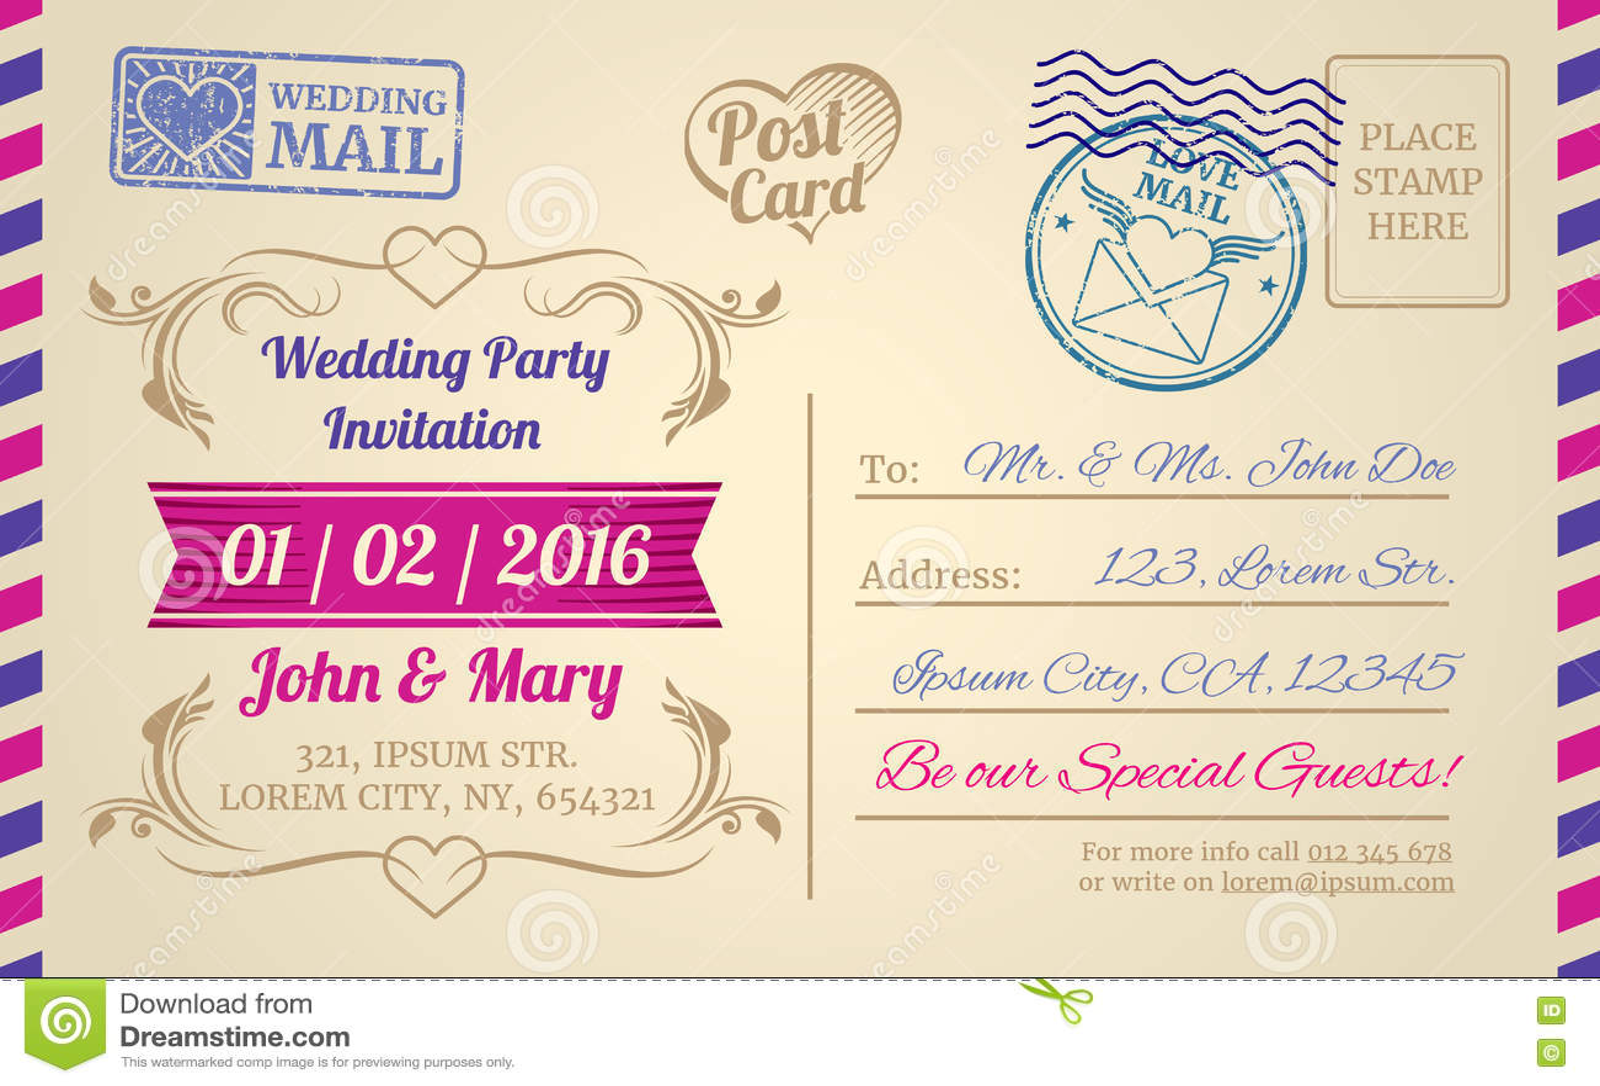 vintage postcard vector template for wedding invitation love letter